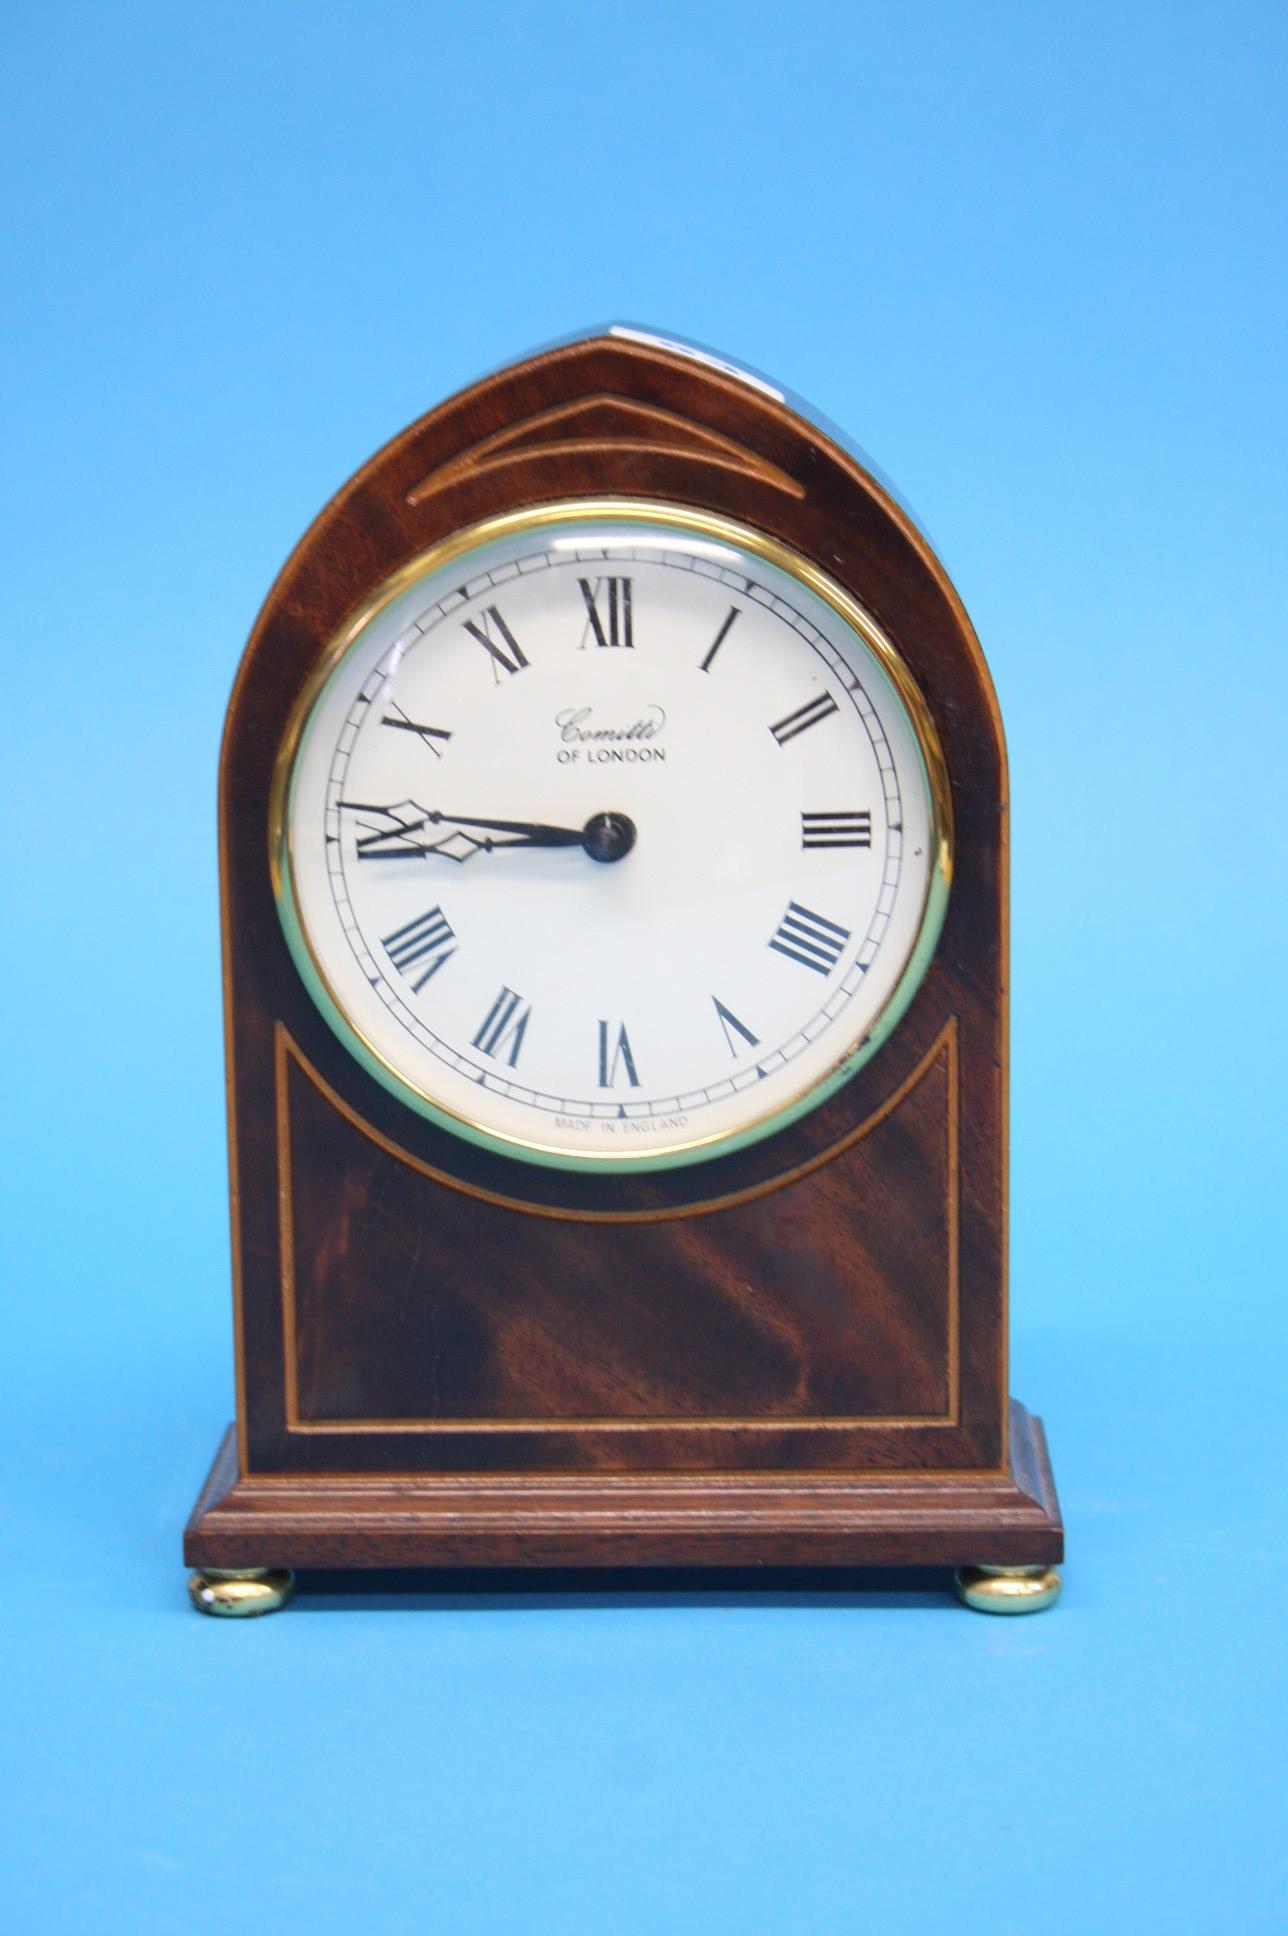 A Comitti of London mantel clock (battery operated